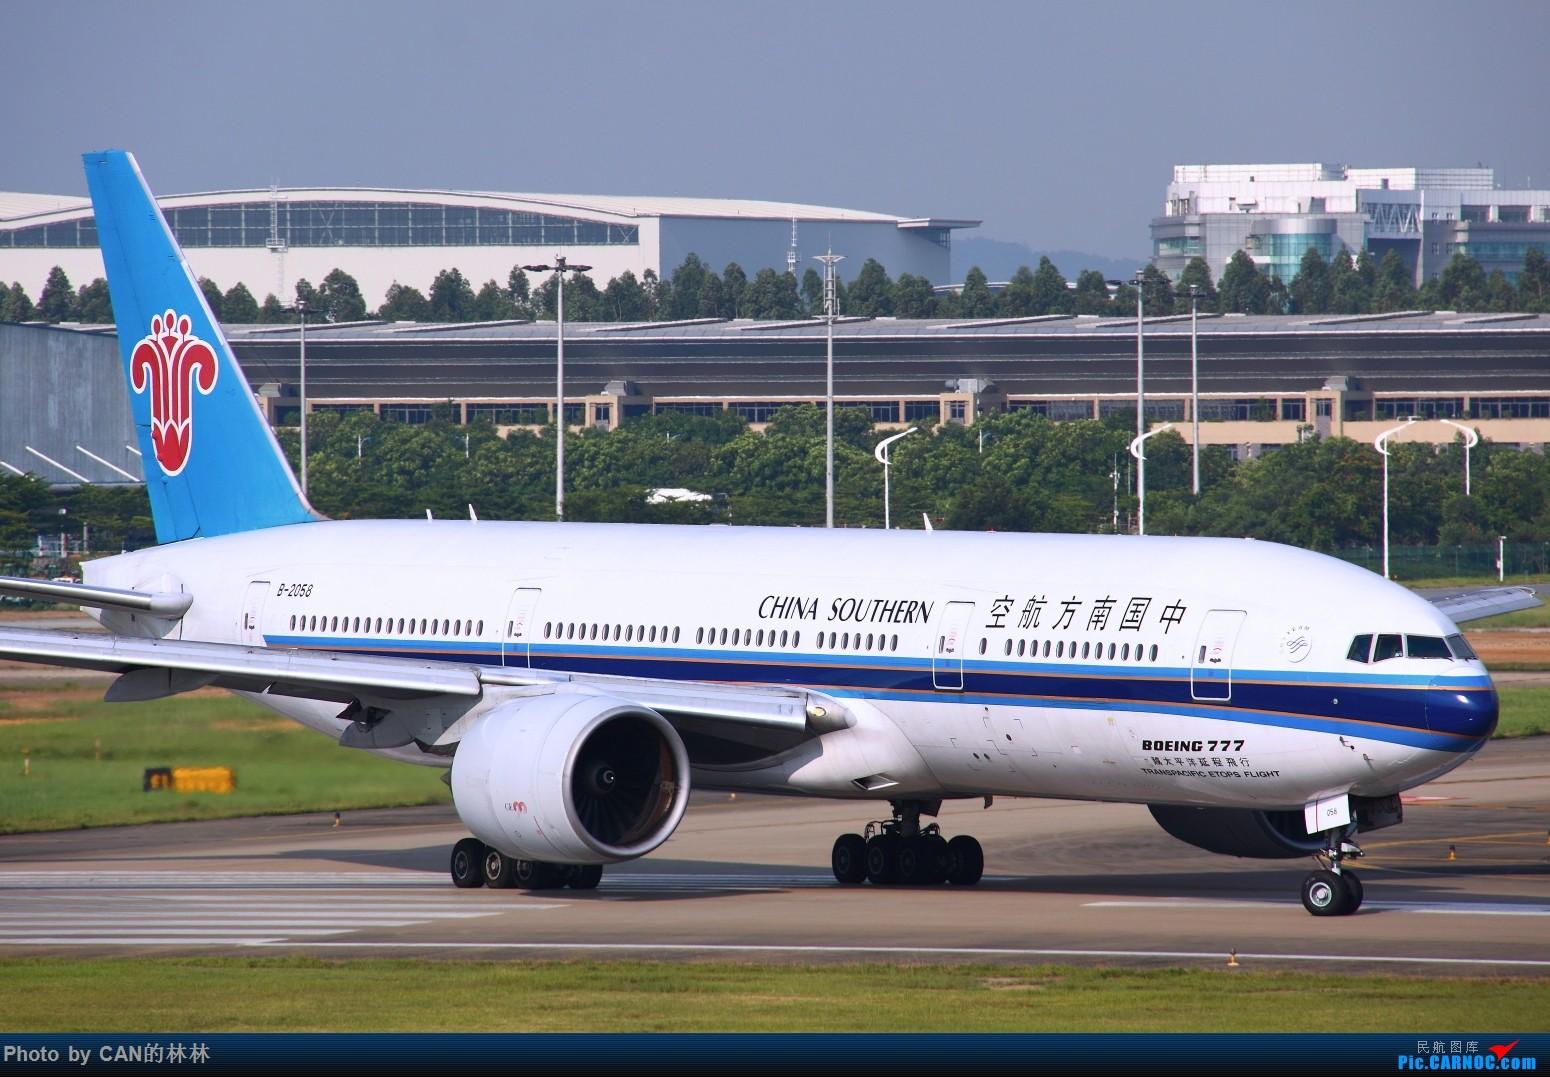 Re:[原创]发一组南航77B存货,都退了,当怀念呗,放电脑存着也发霉 BOEING 777-200 B-2058 中国广州白云国际机场